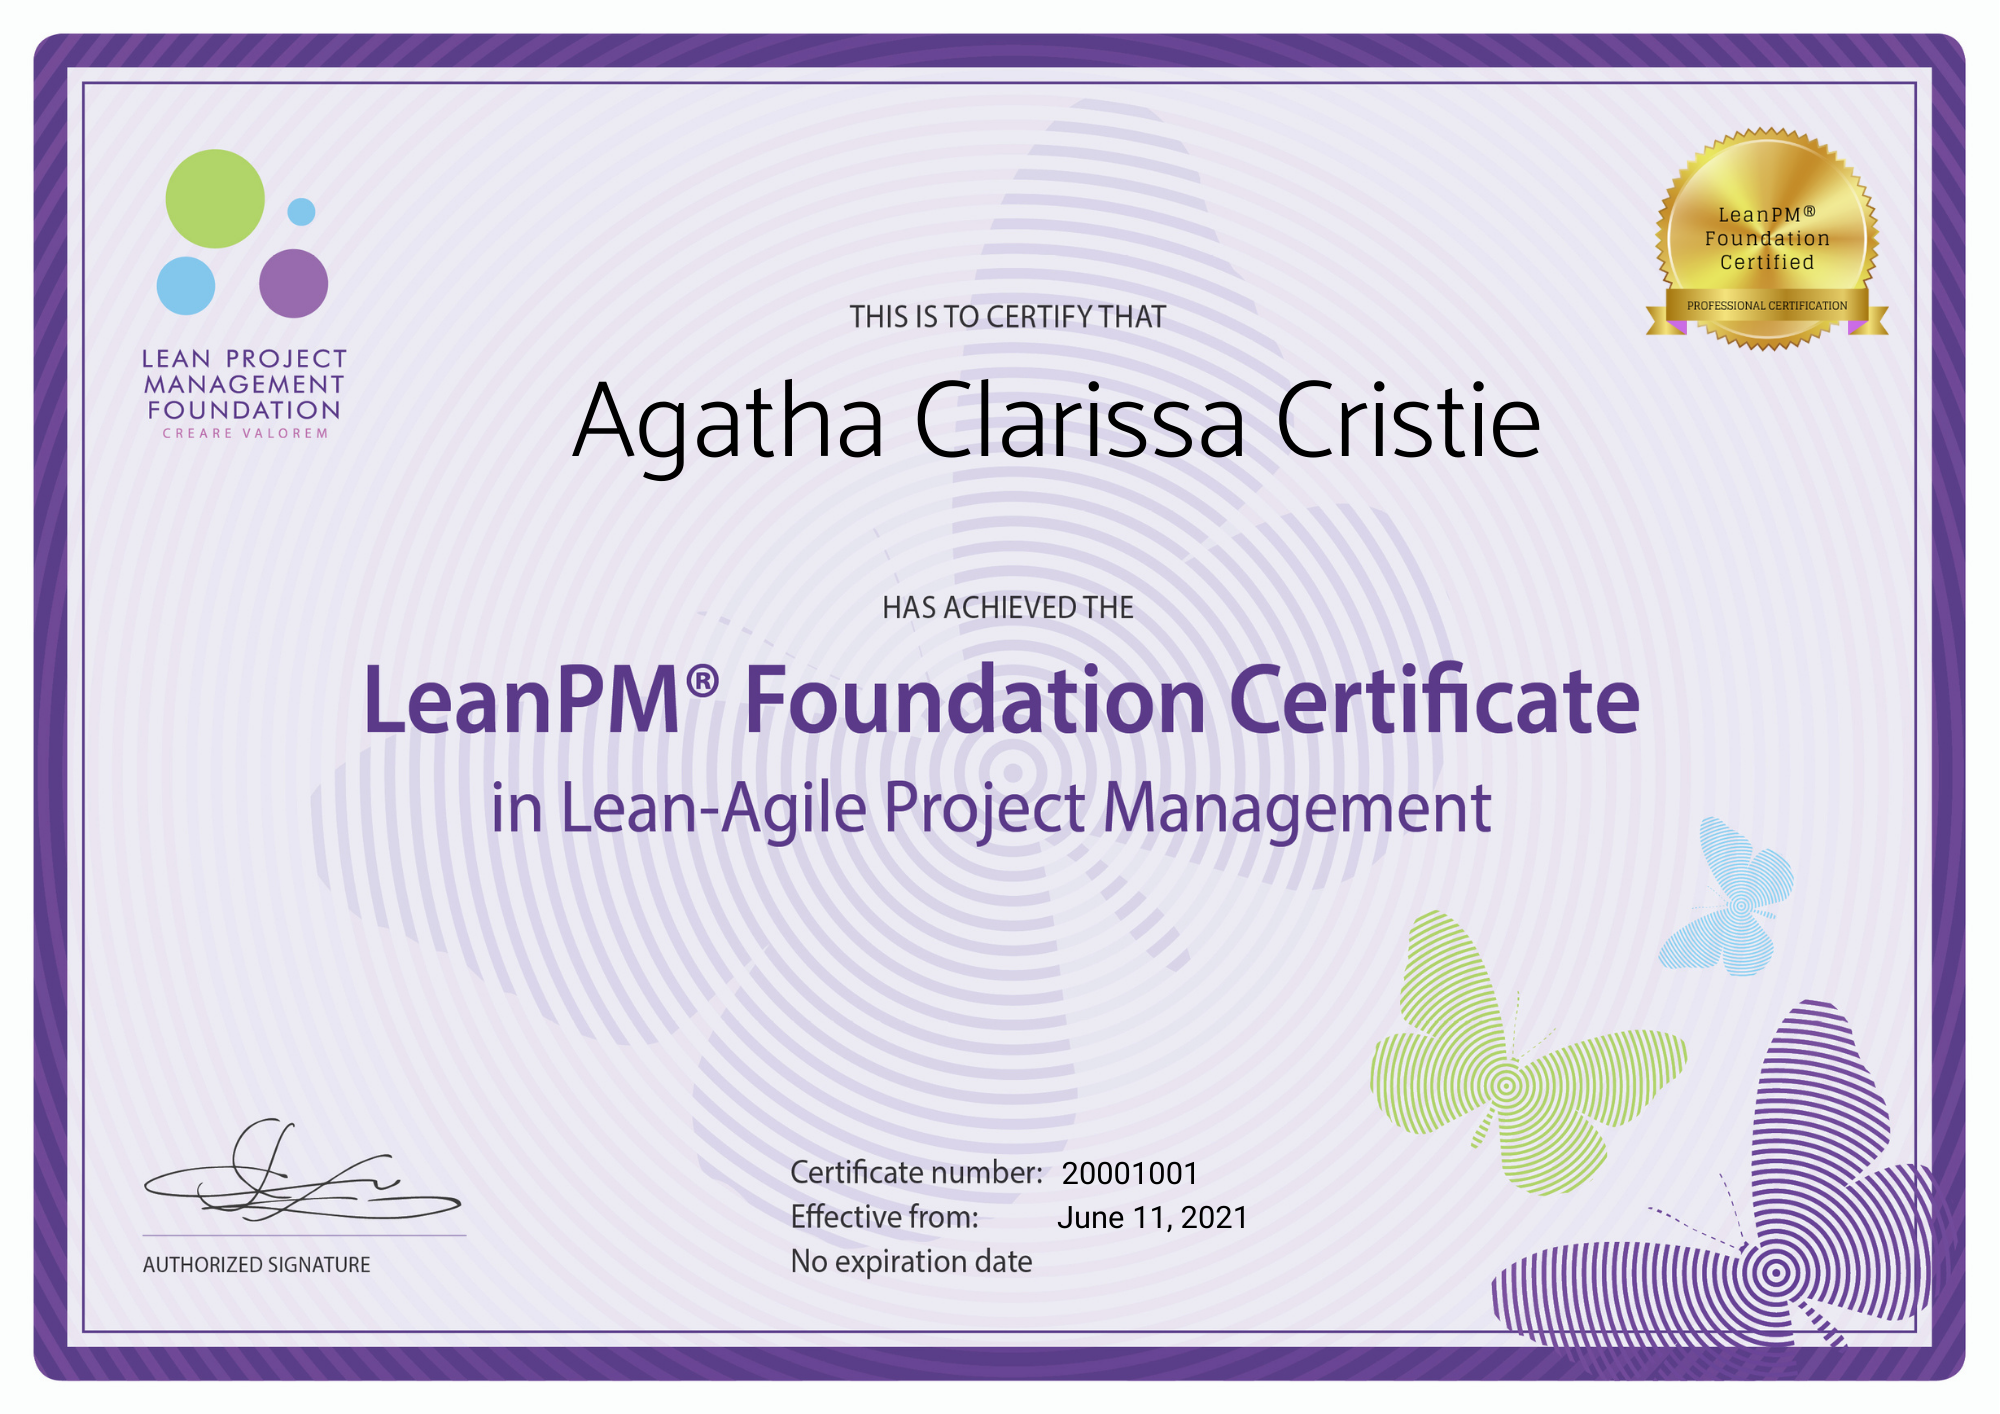 LeanPM Fondation Certificate